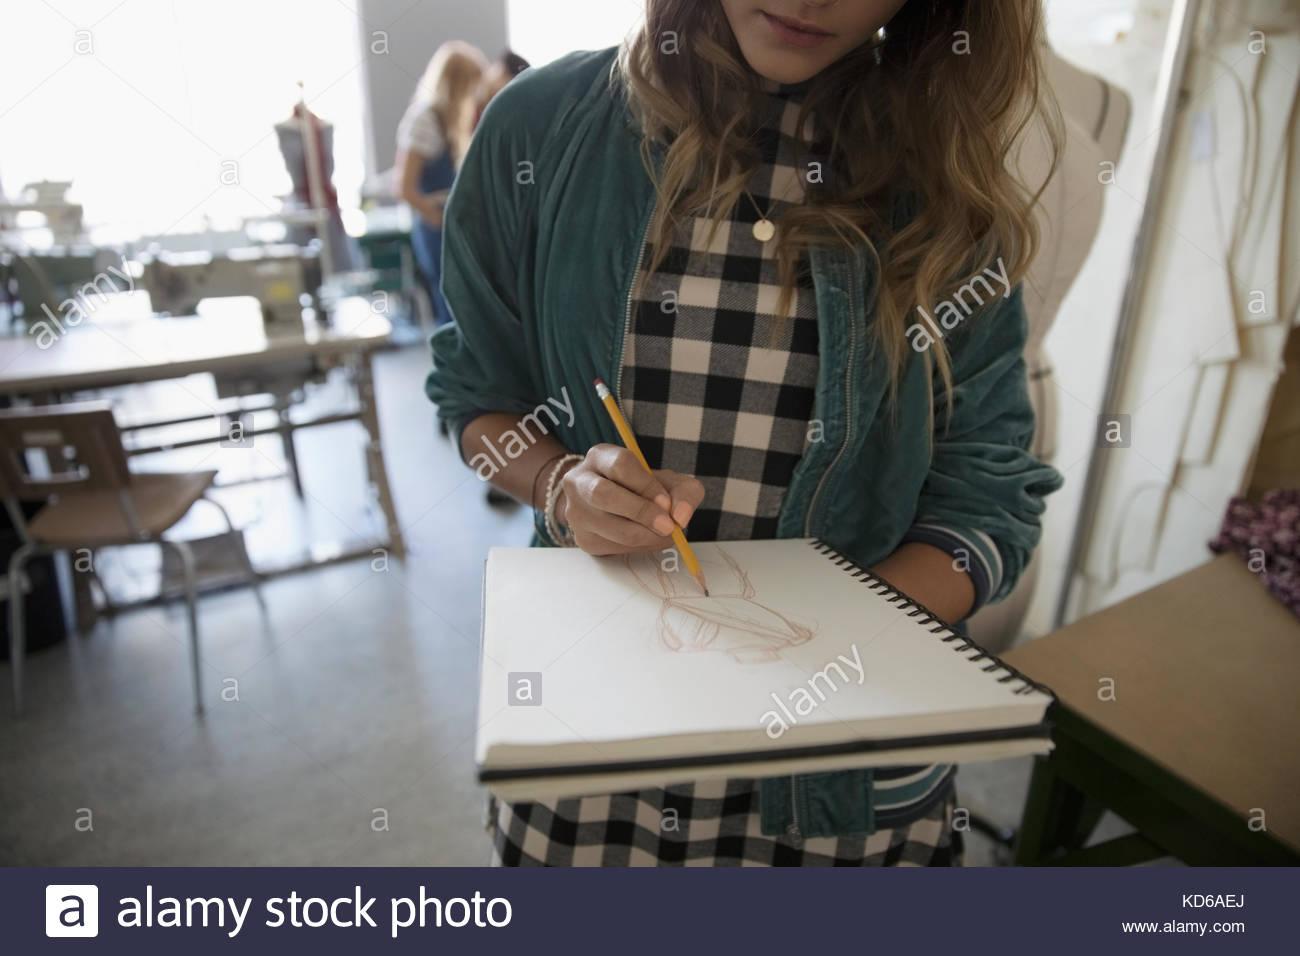 Moda femminile studente di design schizzi in notebook Immagini Stock